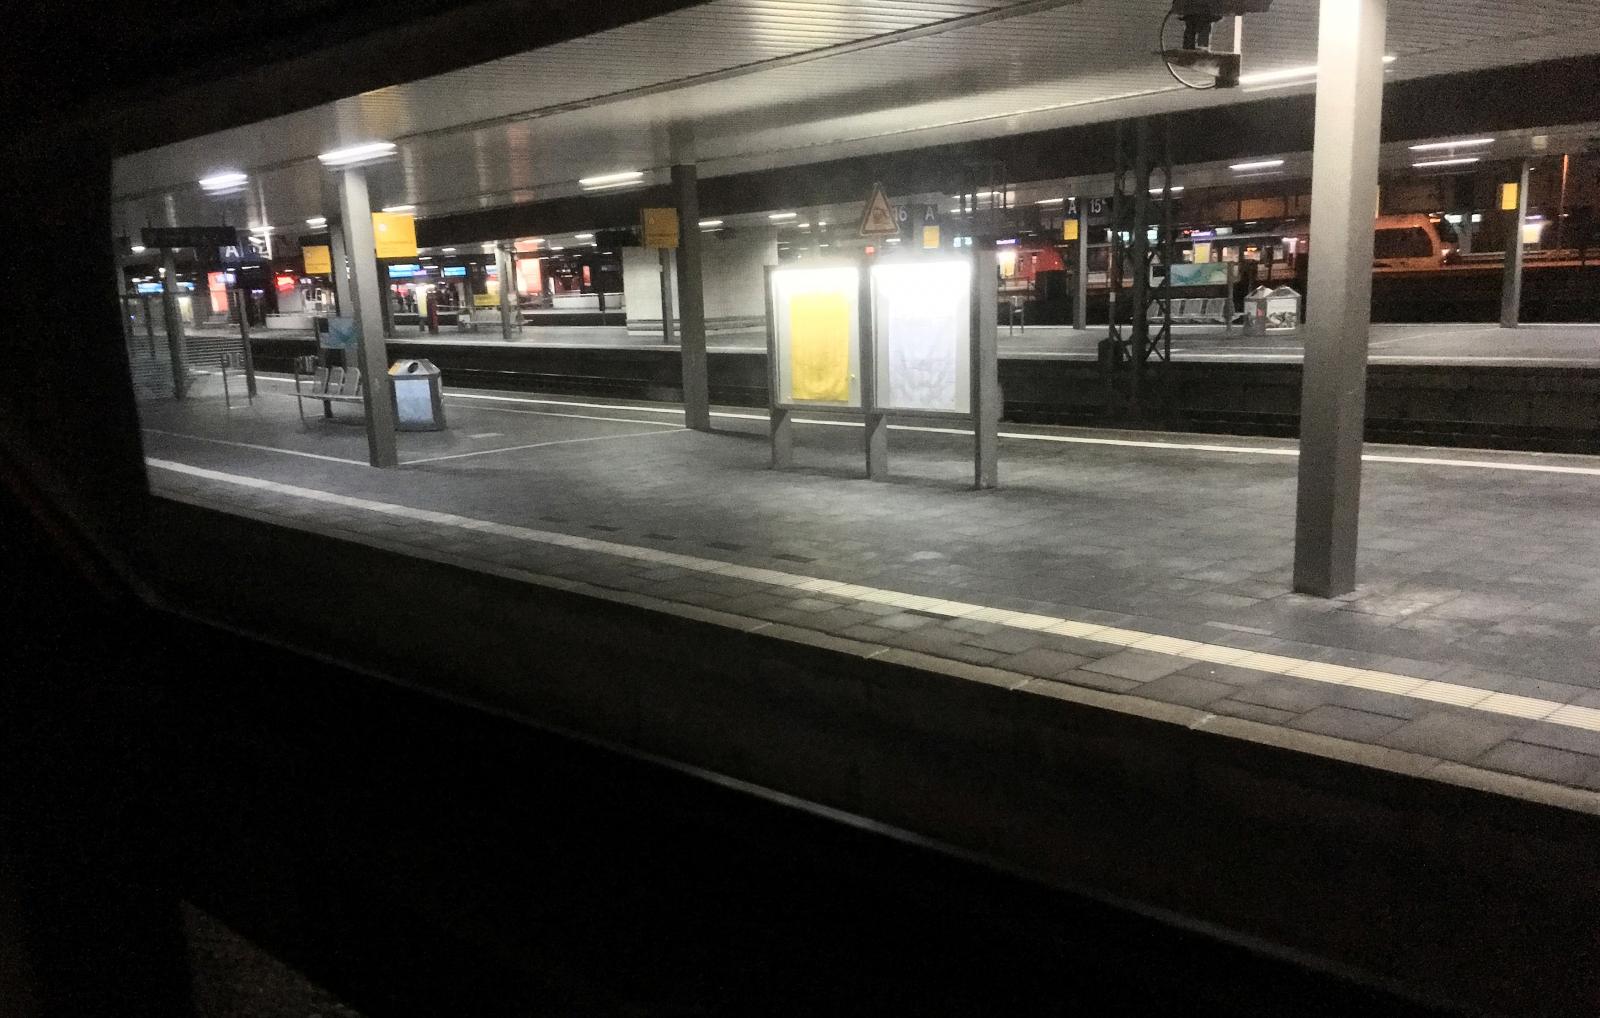 Dusseldorf train station axe attack